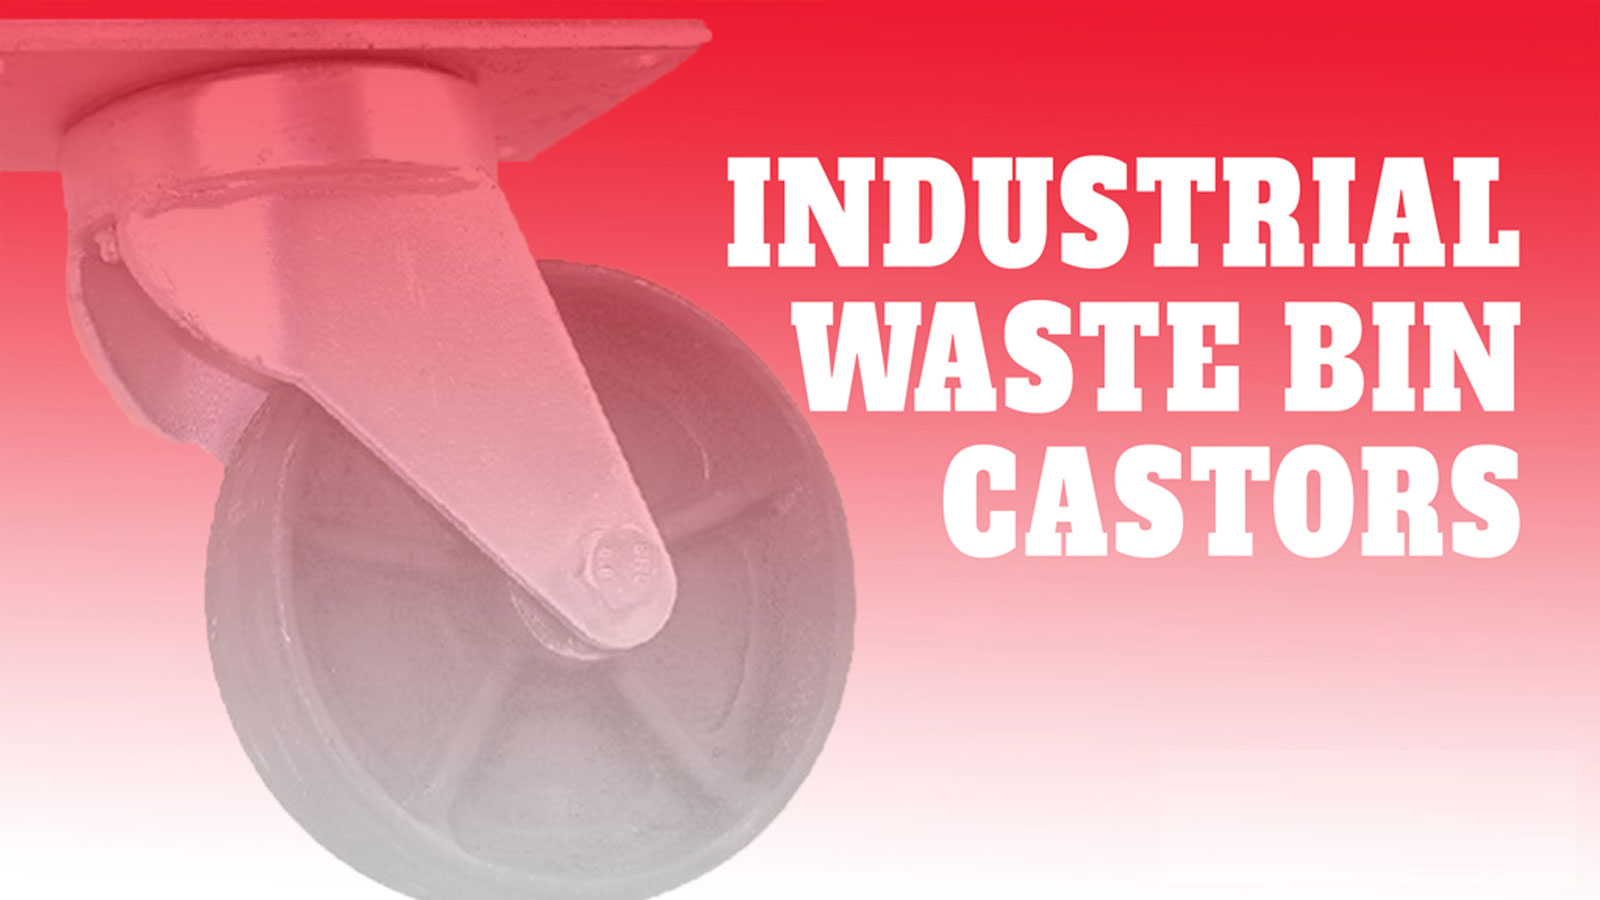 Castor-Industrial